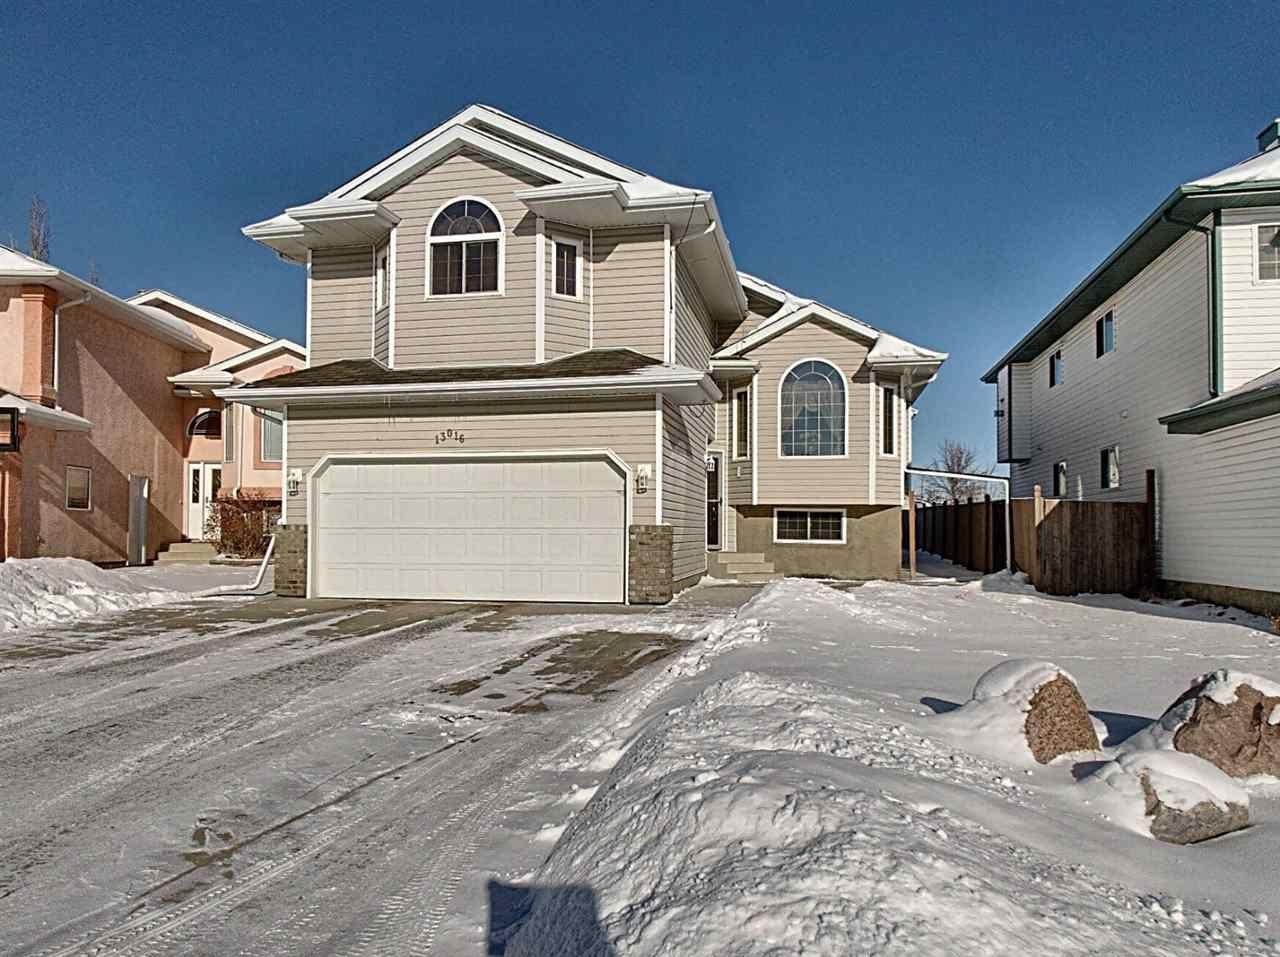 Main Photo: 13016 141C Avenue NW in Edmonton: Zone 27 House for sale : MLS®# E4228393